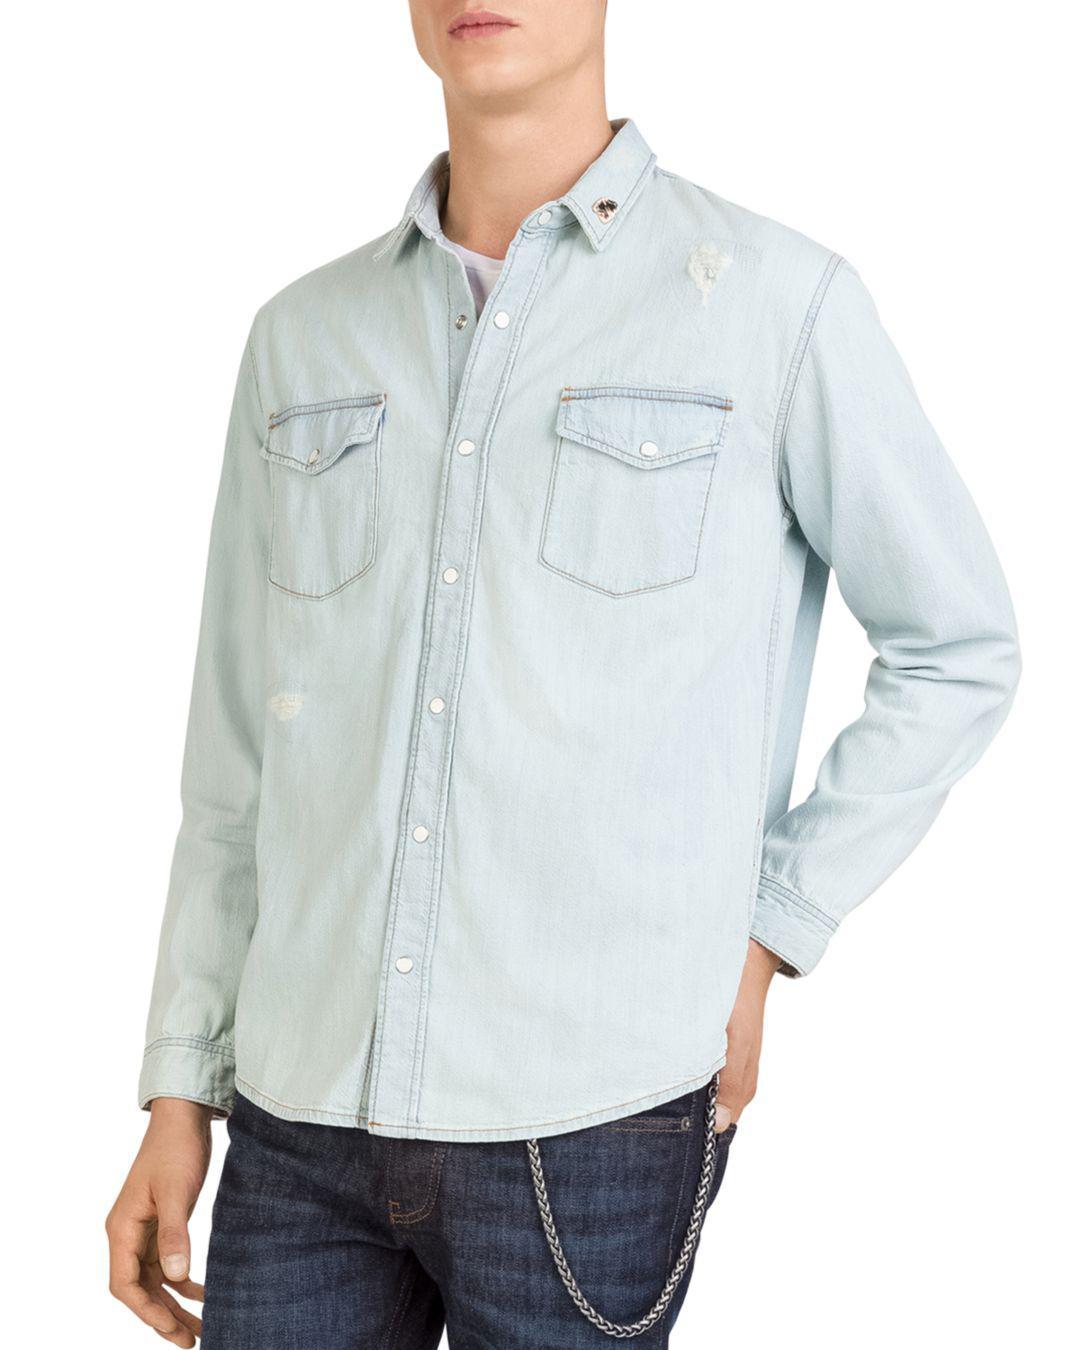 de2f3a7071f Lyst - The Kooples Distressed Denim Shirt in Blue for Men